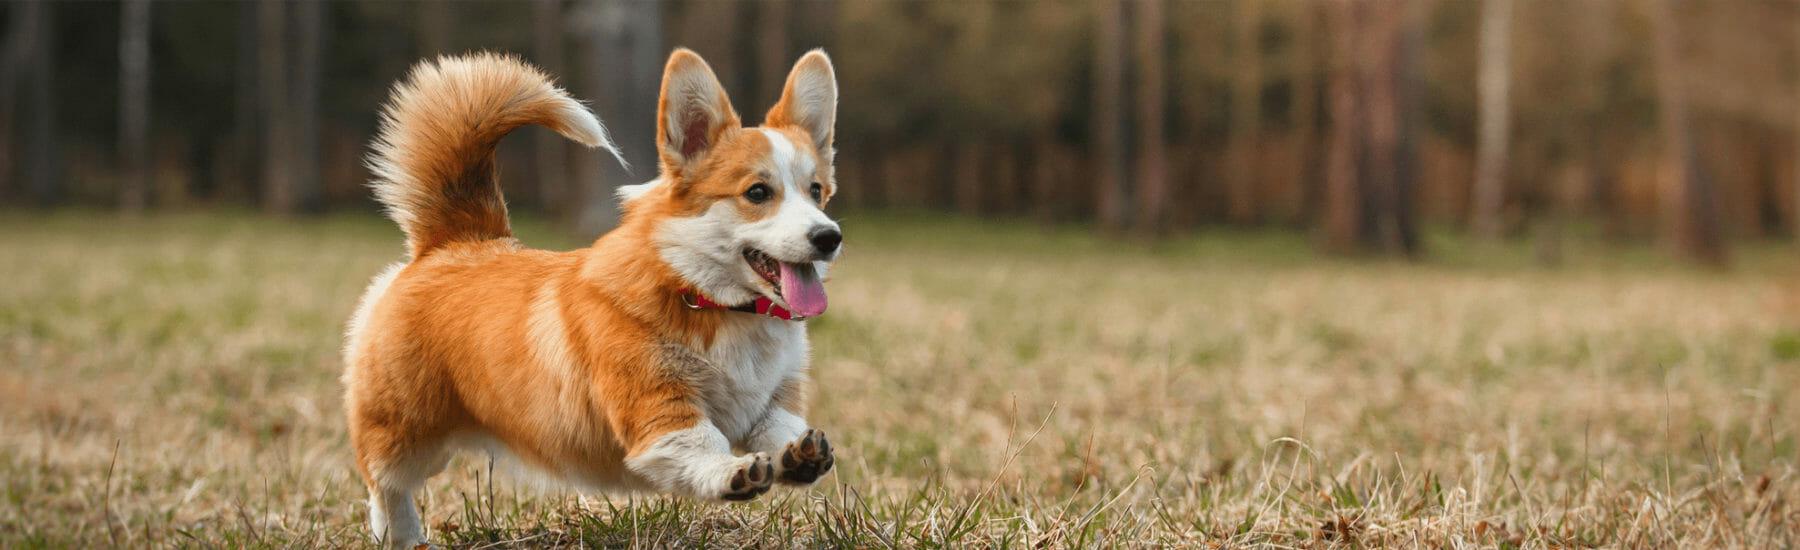 Small orange dog jumping through the air